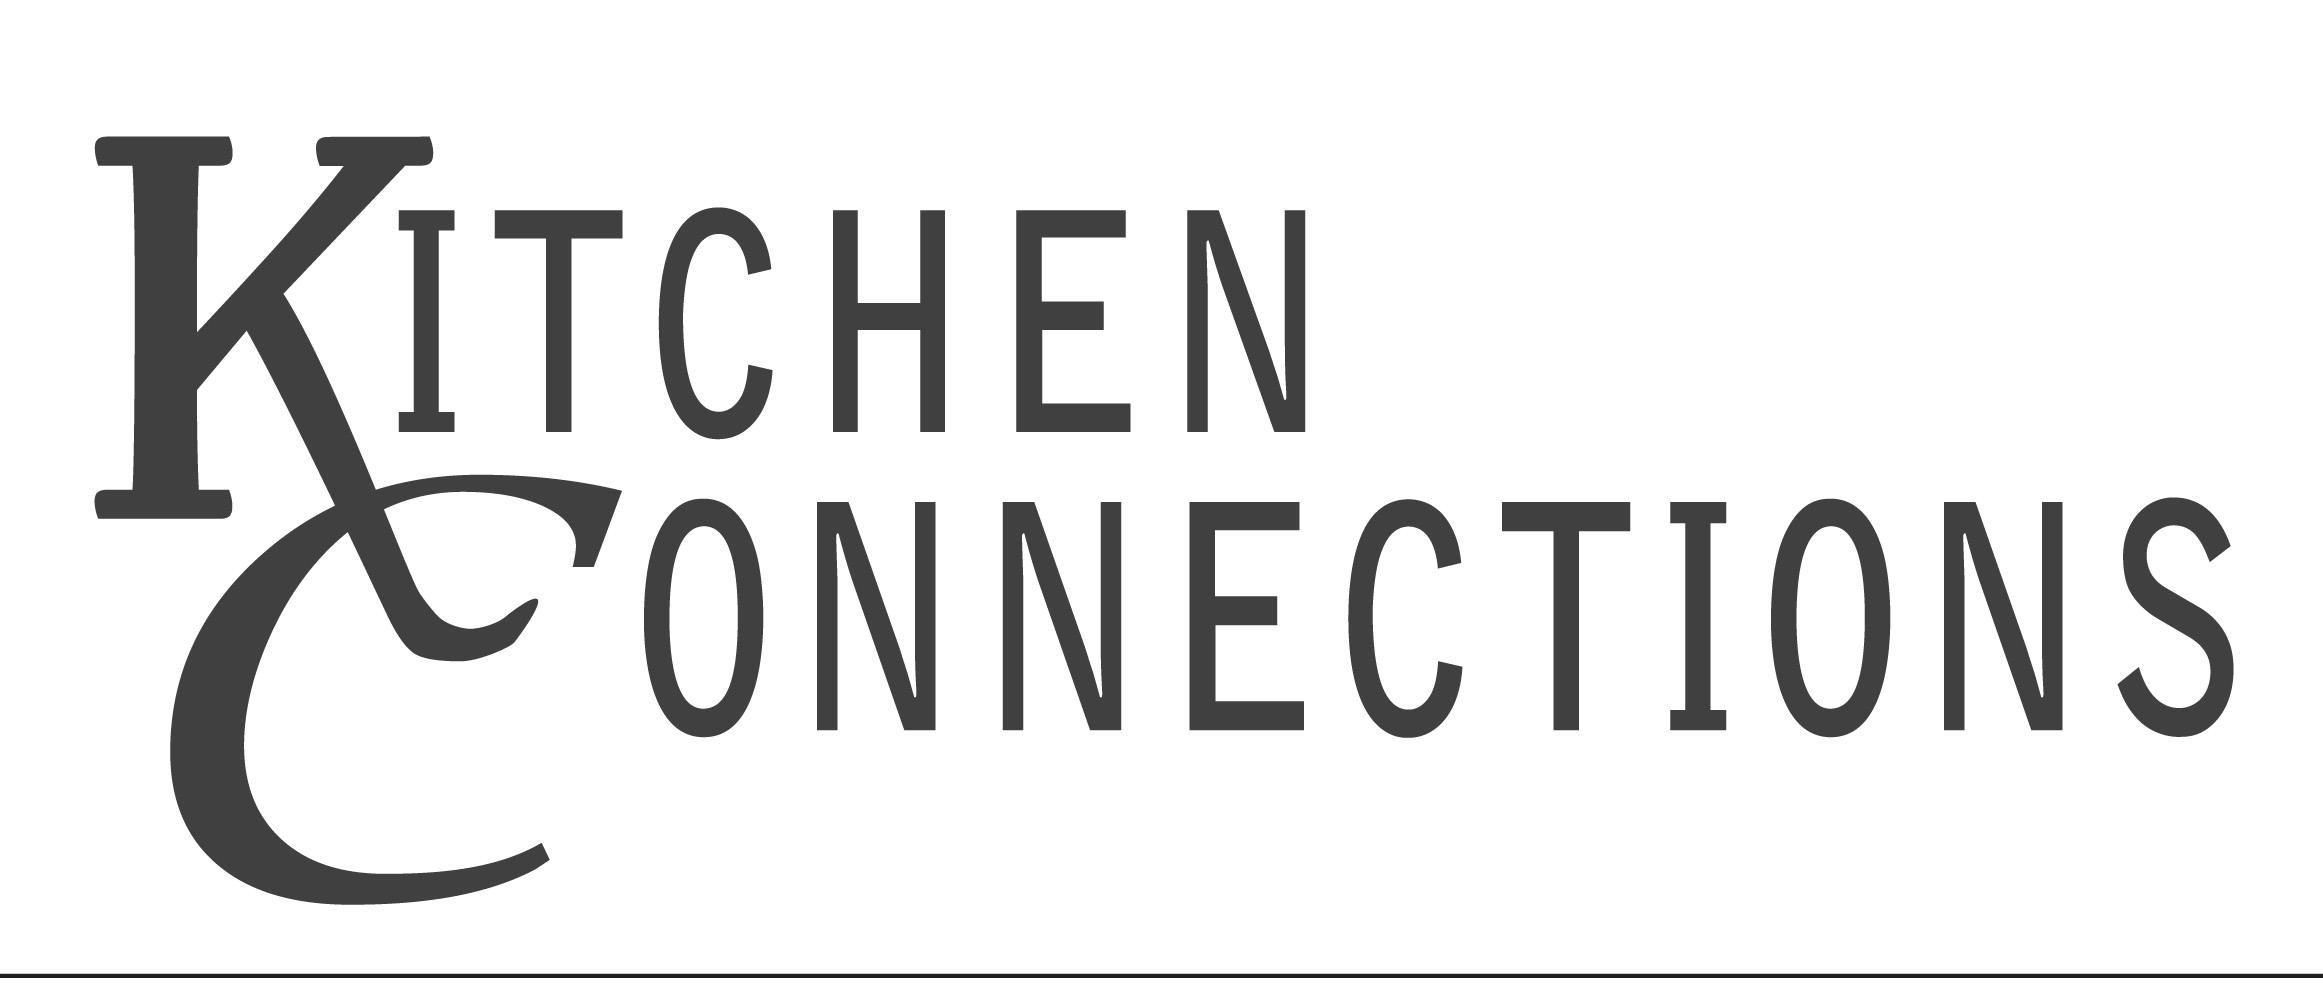 Kicthen Connections Logo